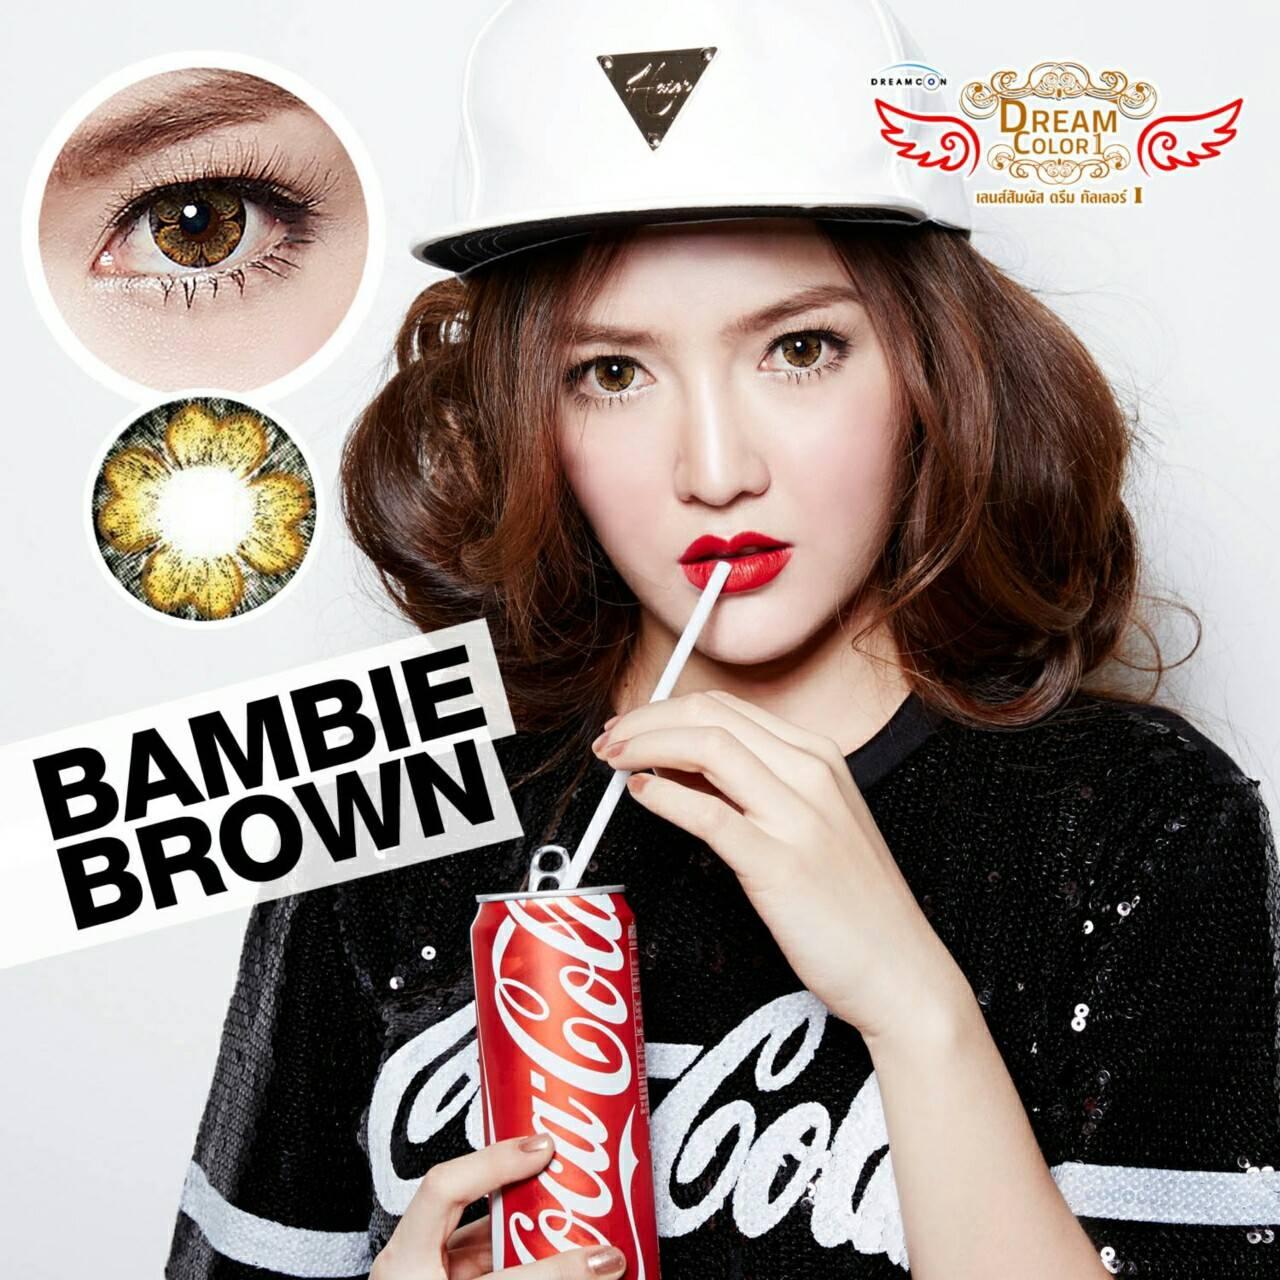 Bambie Brown Dreamcolor1เลนส์นิ่มใส่สบาย คอนแทคเลนส์ ขายส่งคอนแทคเลนส์ ขายส่งBigeye Bigeyeเกาหลี